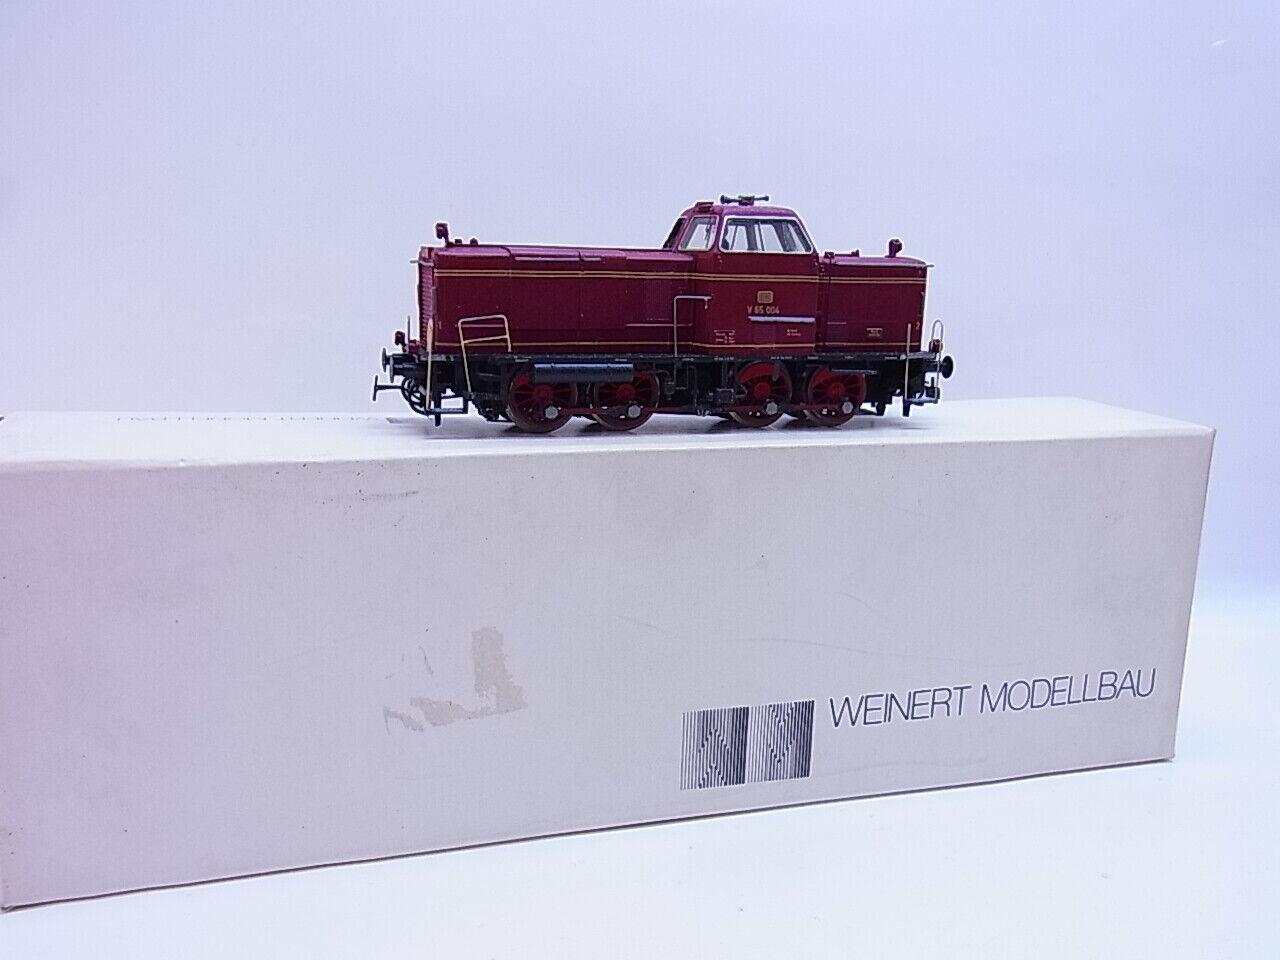 56545 Weinert h0 4006 diesellok V 65 de la DB en OVP para modelo ferroviario